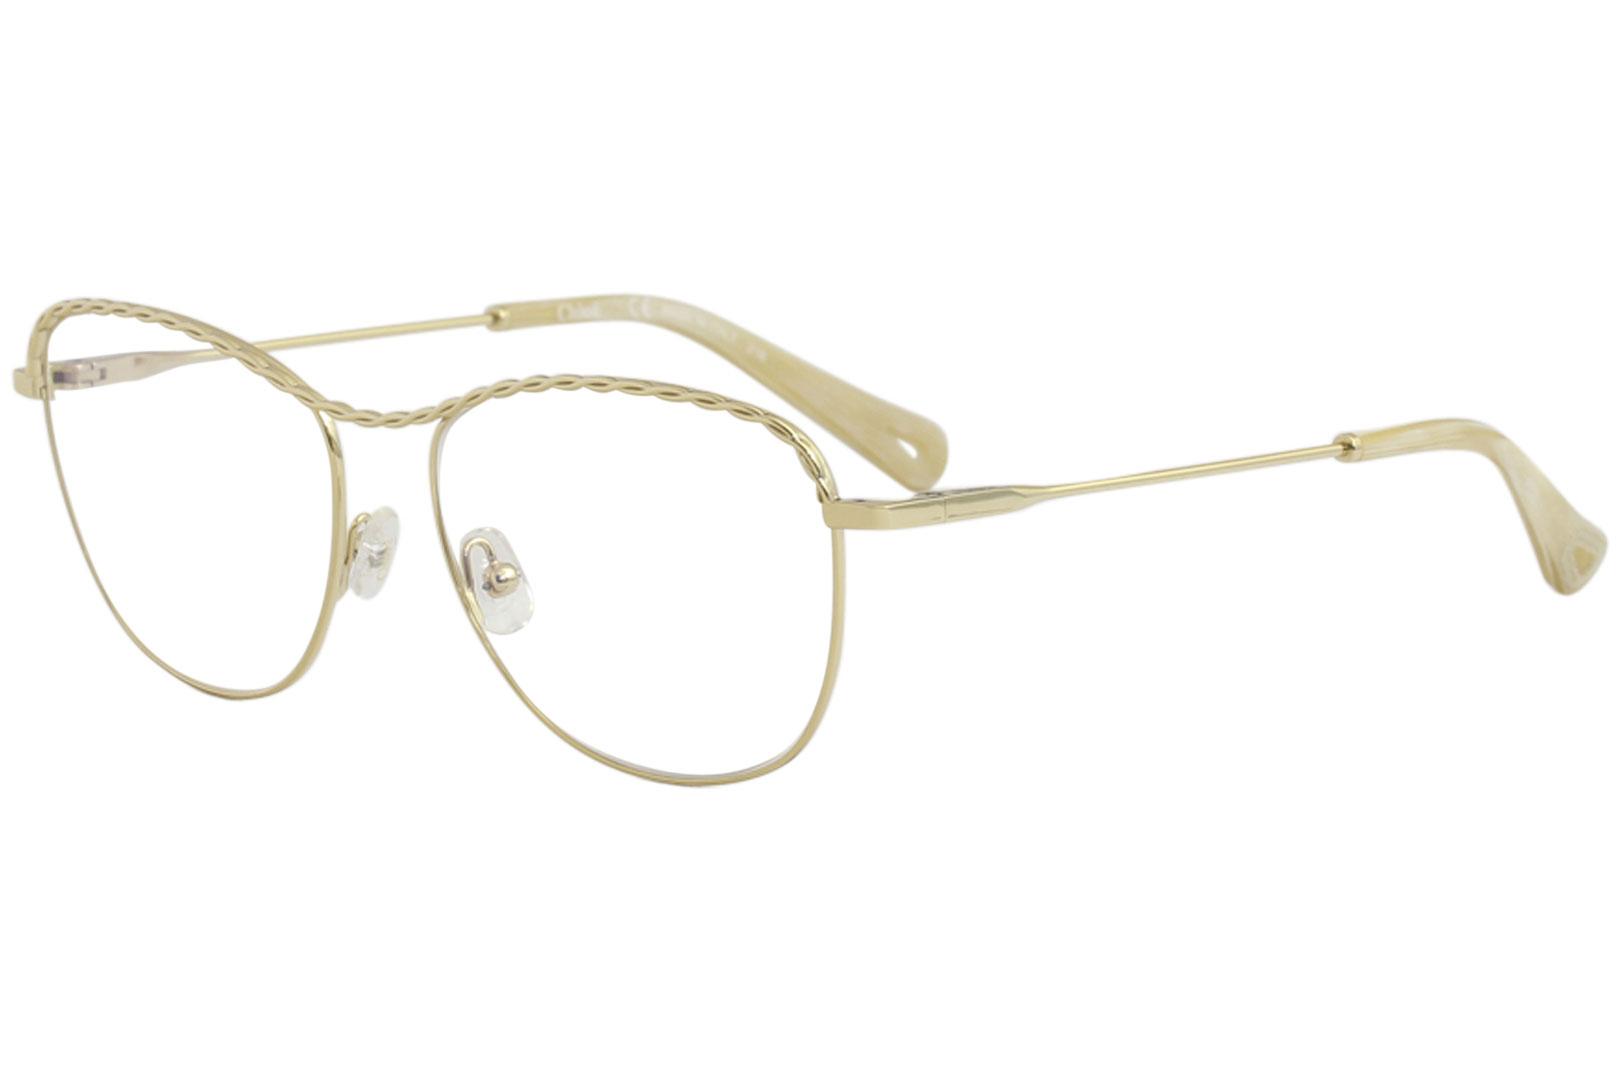 f51c8b817b2 Chloe Women s Eyeglasses CE2139 CE 2139 717 Gold Full Rim Optical ...